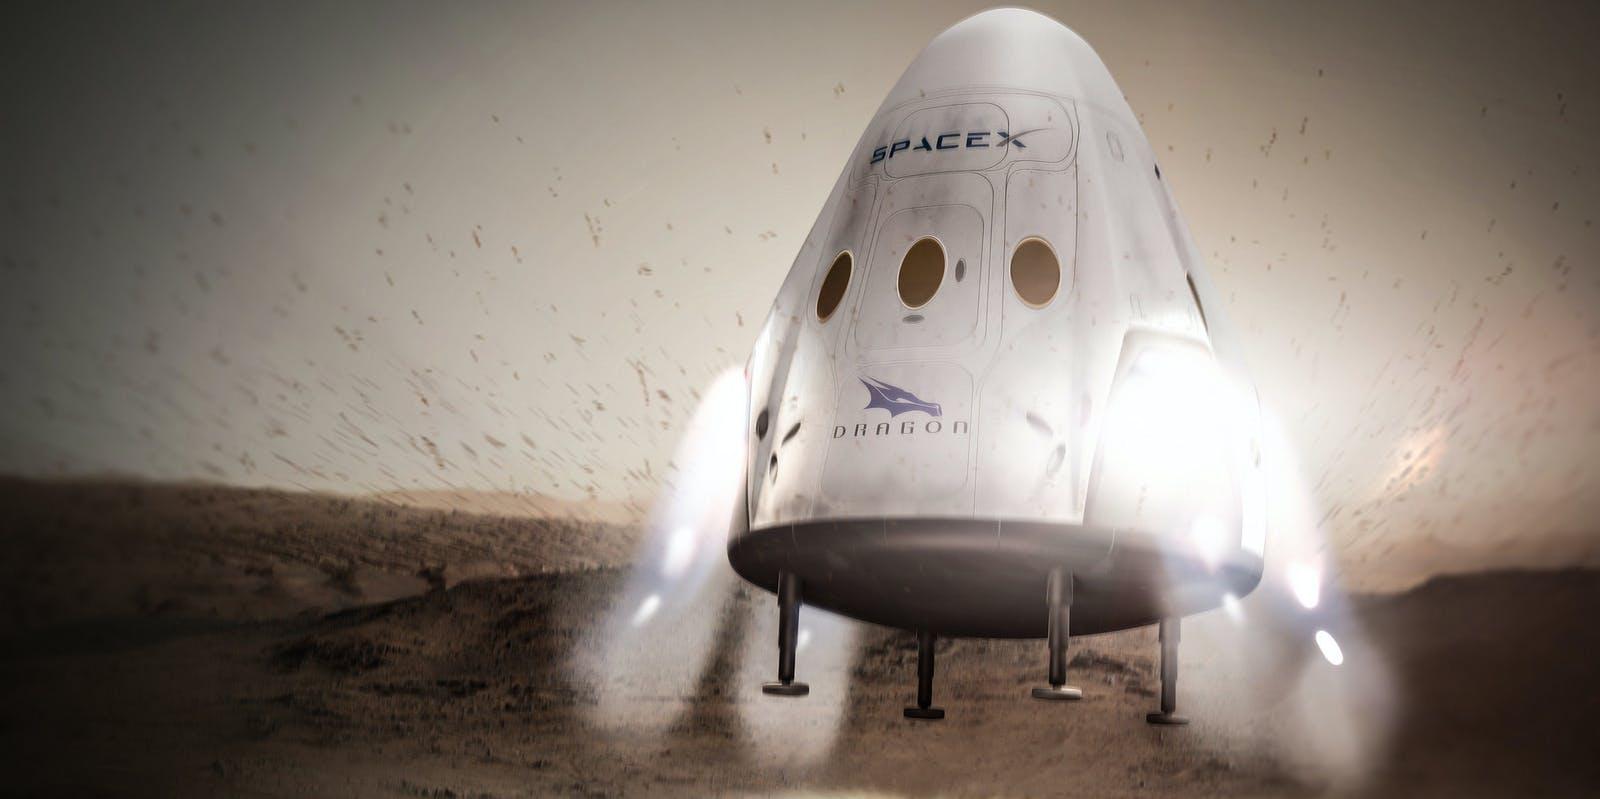 Concept art of Dragon spacecraft landing on Mars